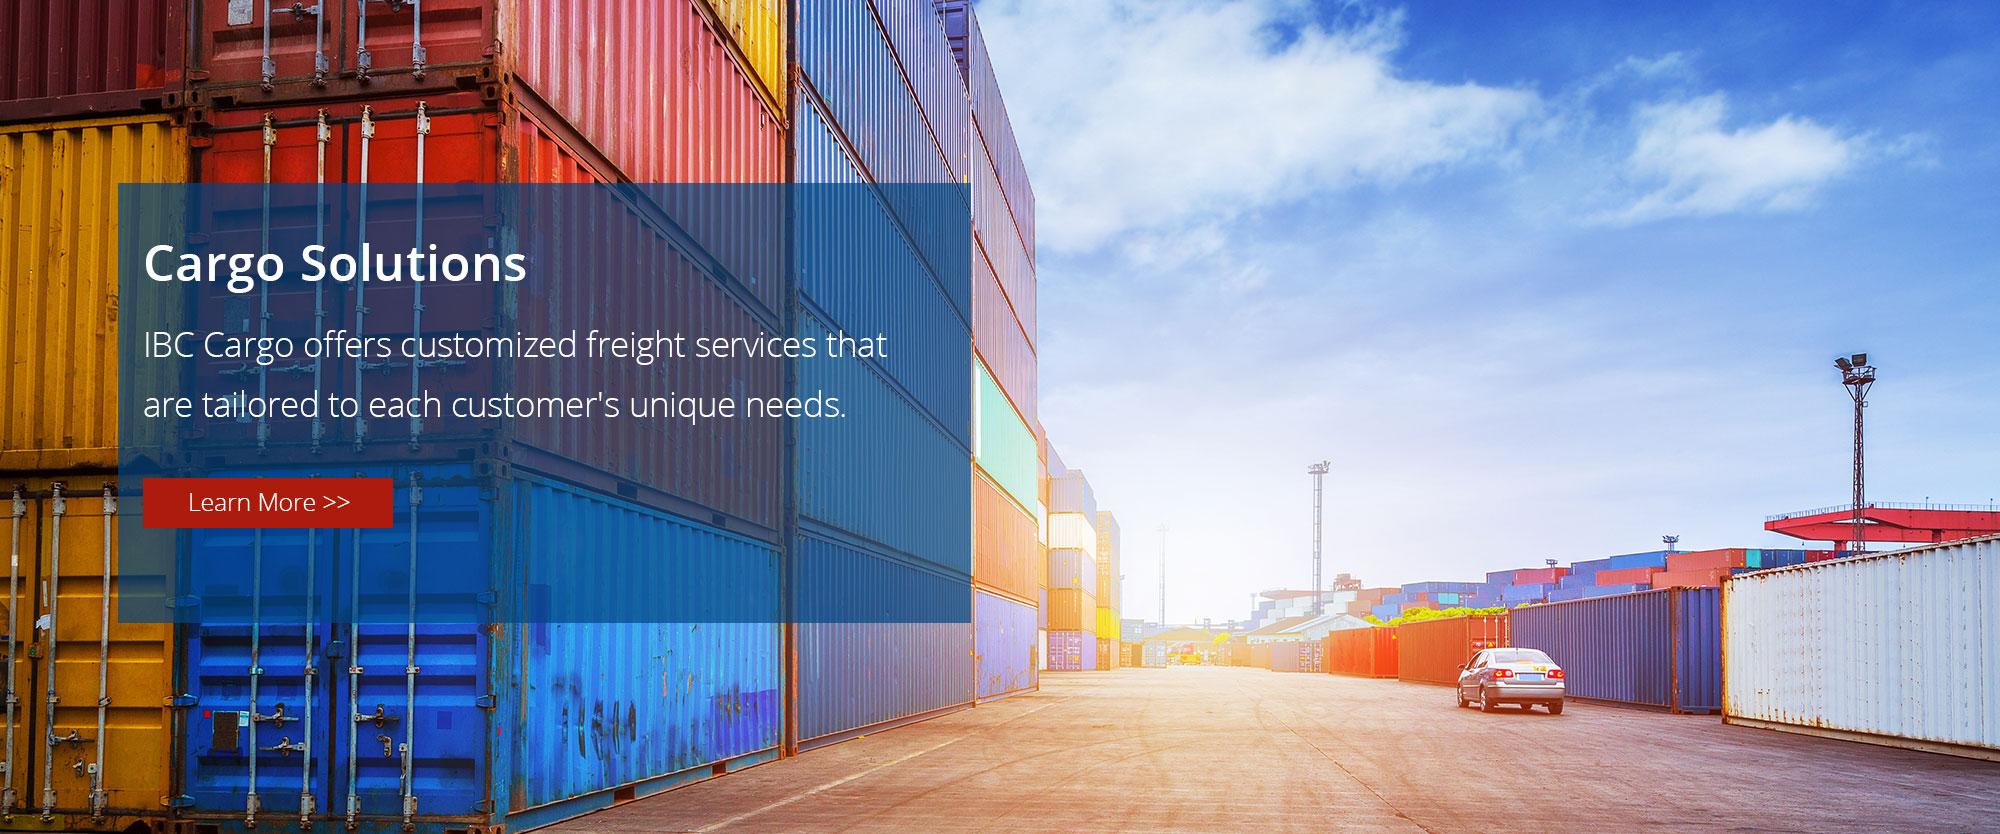 International Cargo, Import, Export